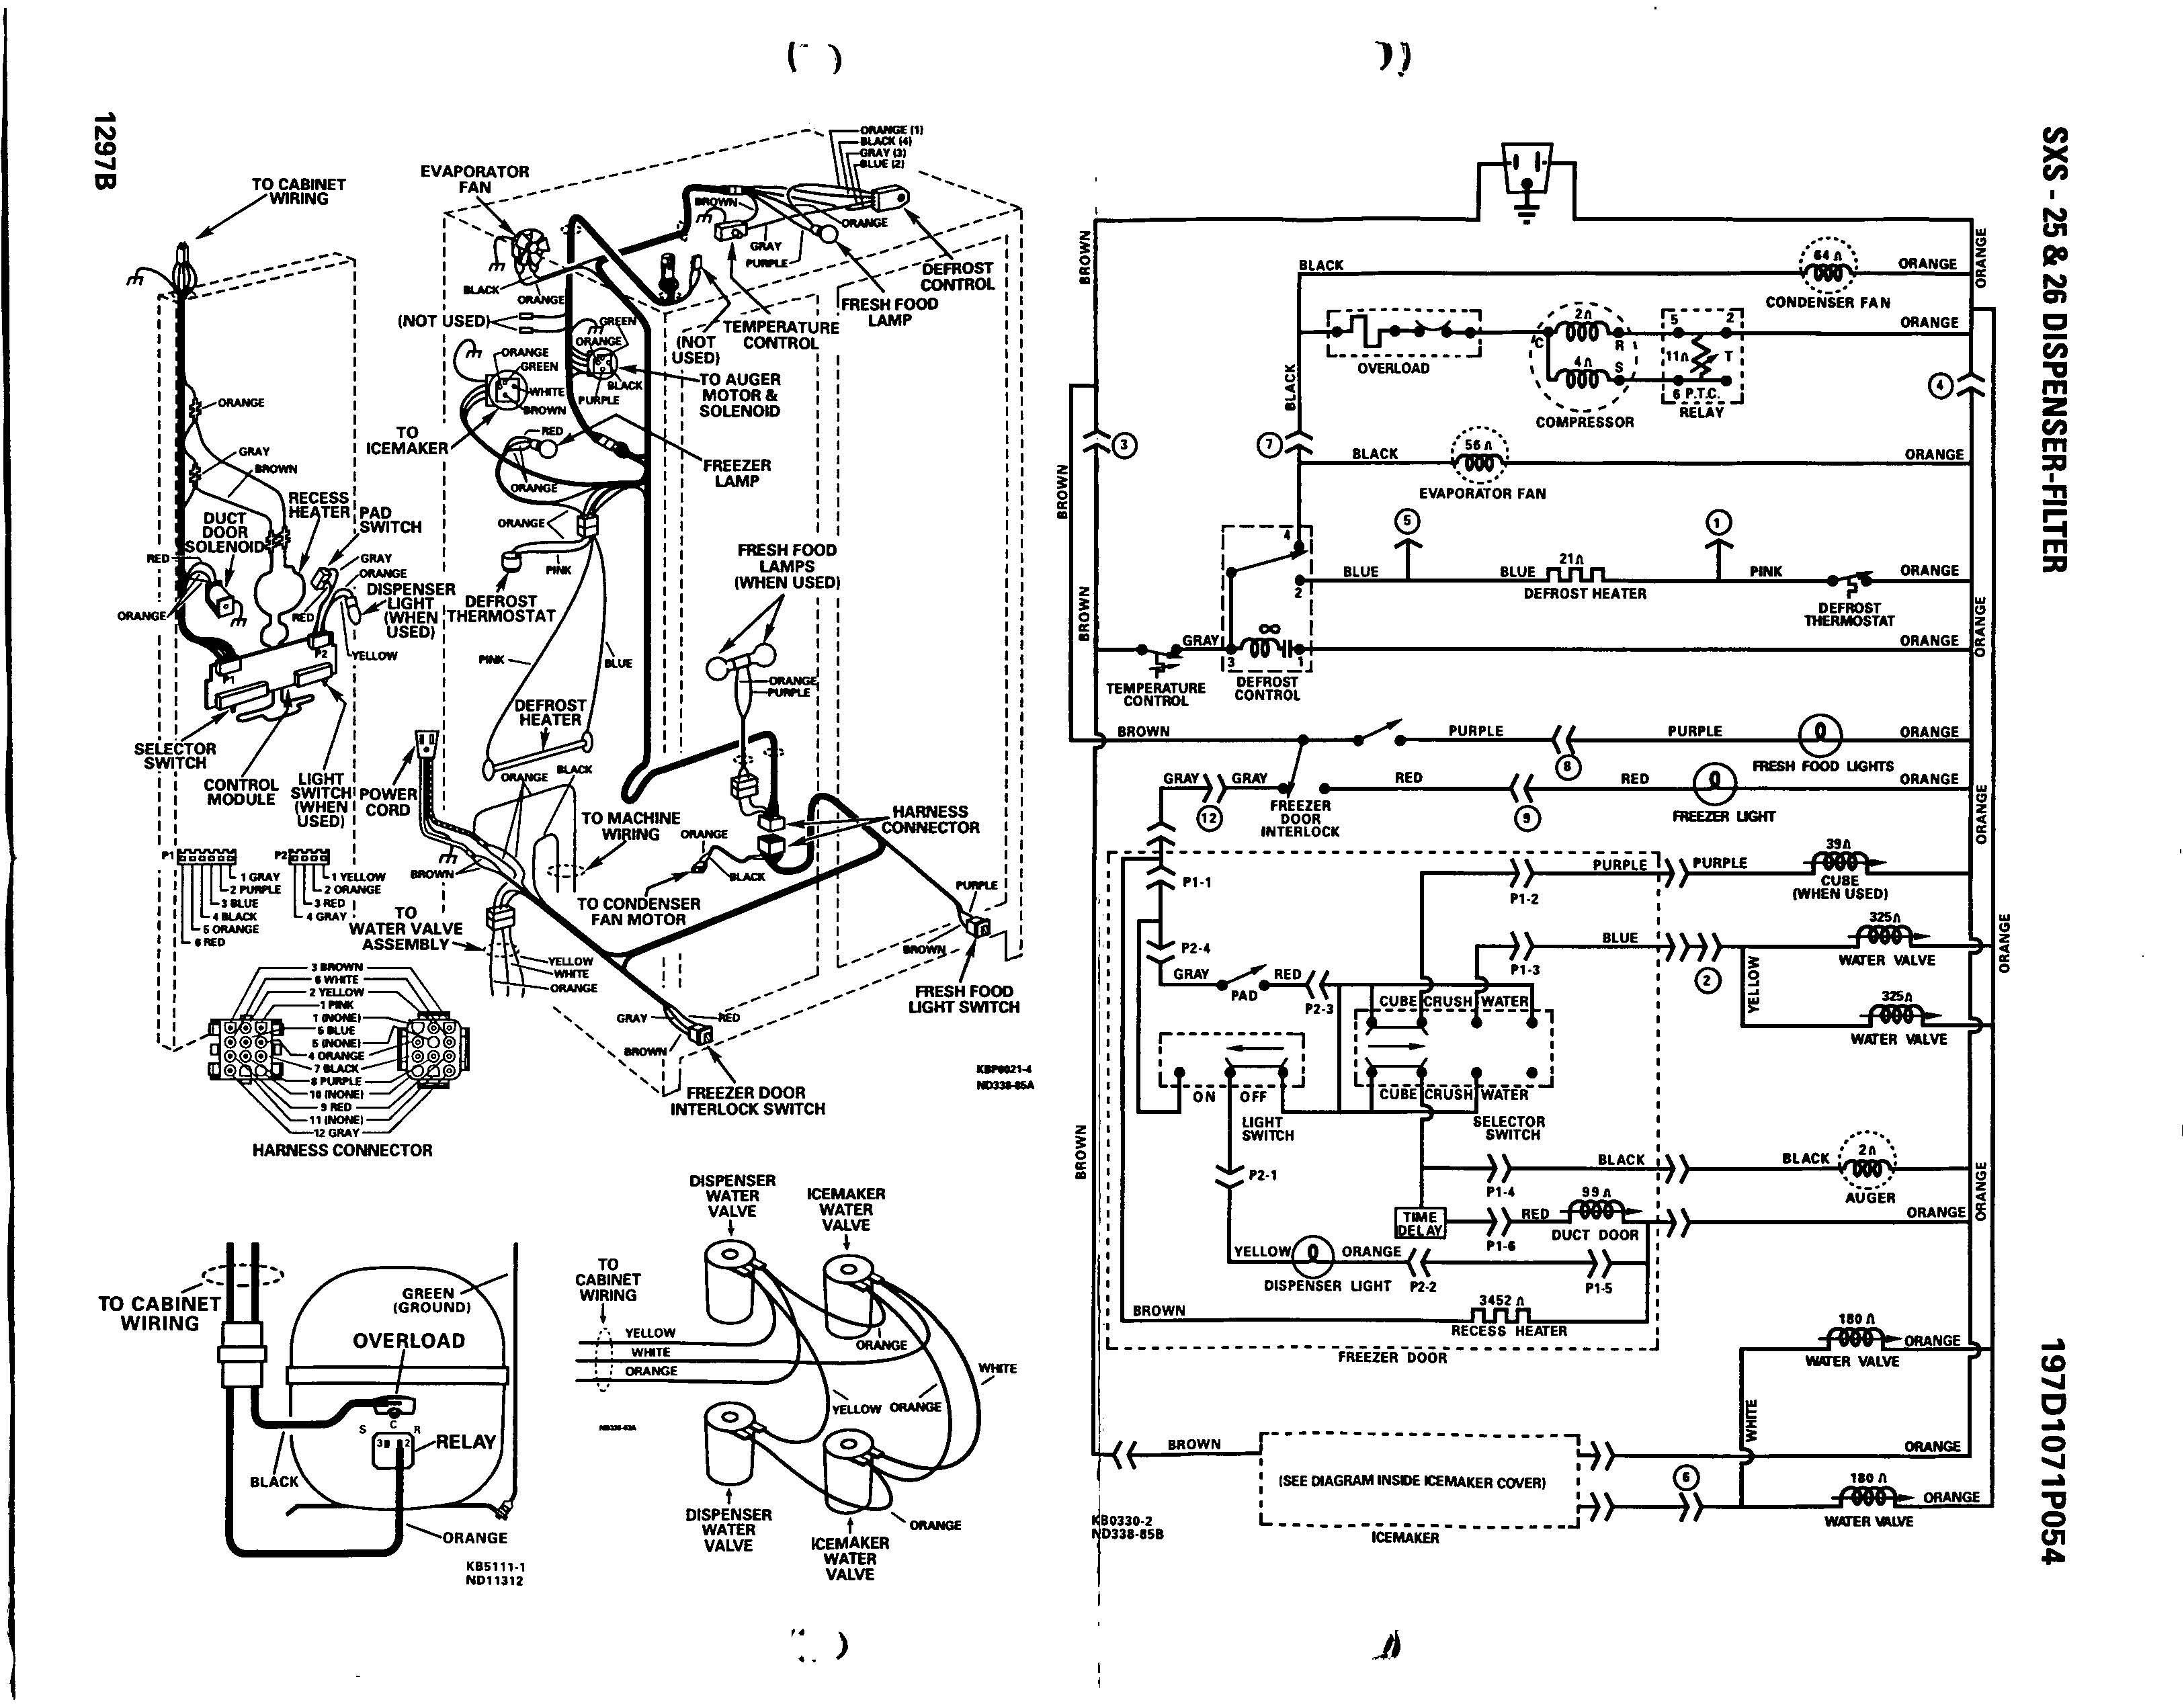 Ge 75 Hp Wiring Diagram - Wiring Diagrams Lol Ge Ajes Dcbm Wiring Schematic on